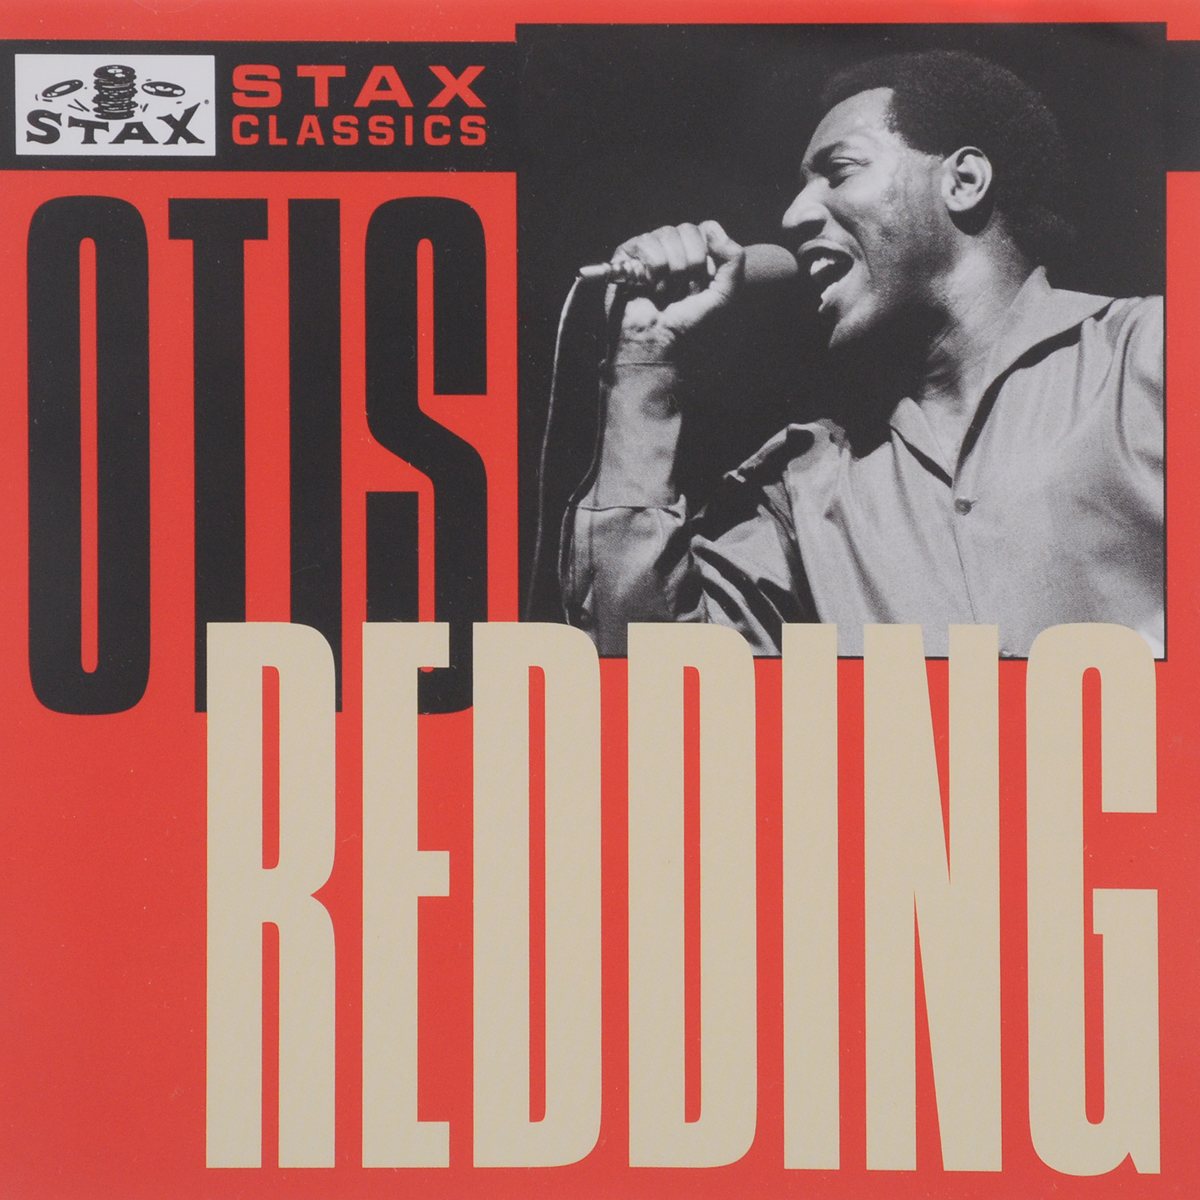 Отис Реддинг Otis Redding. Stax Classics stax hps 2